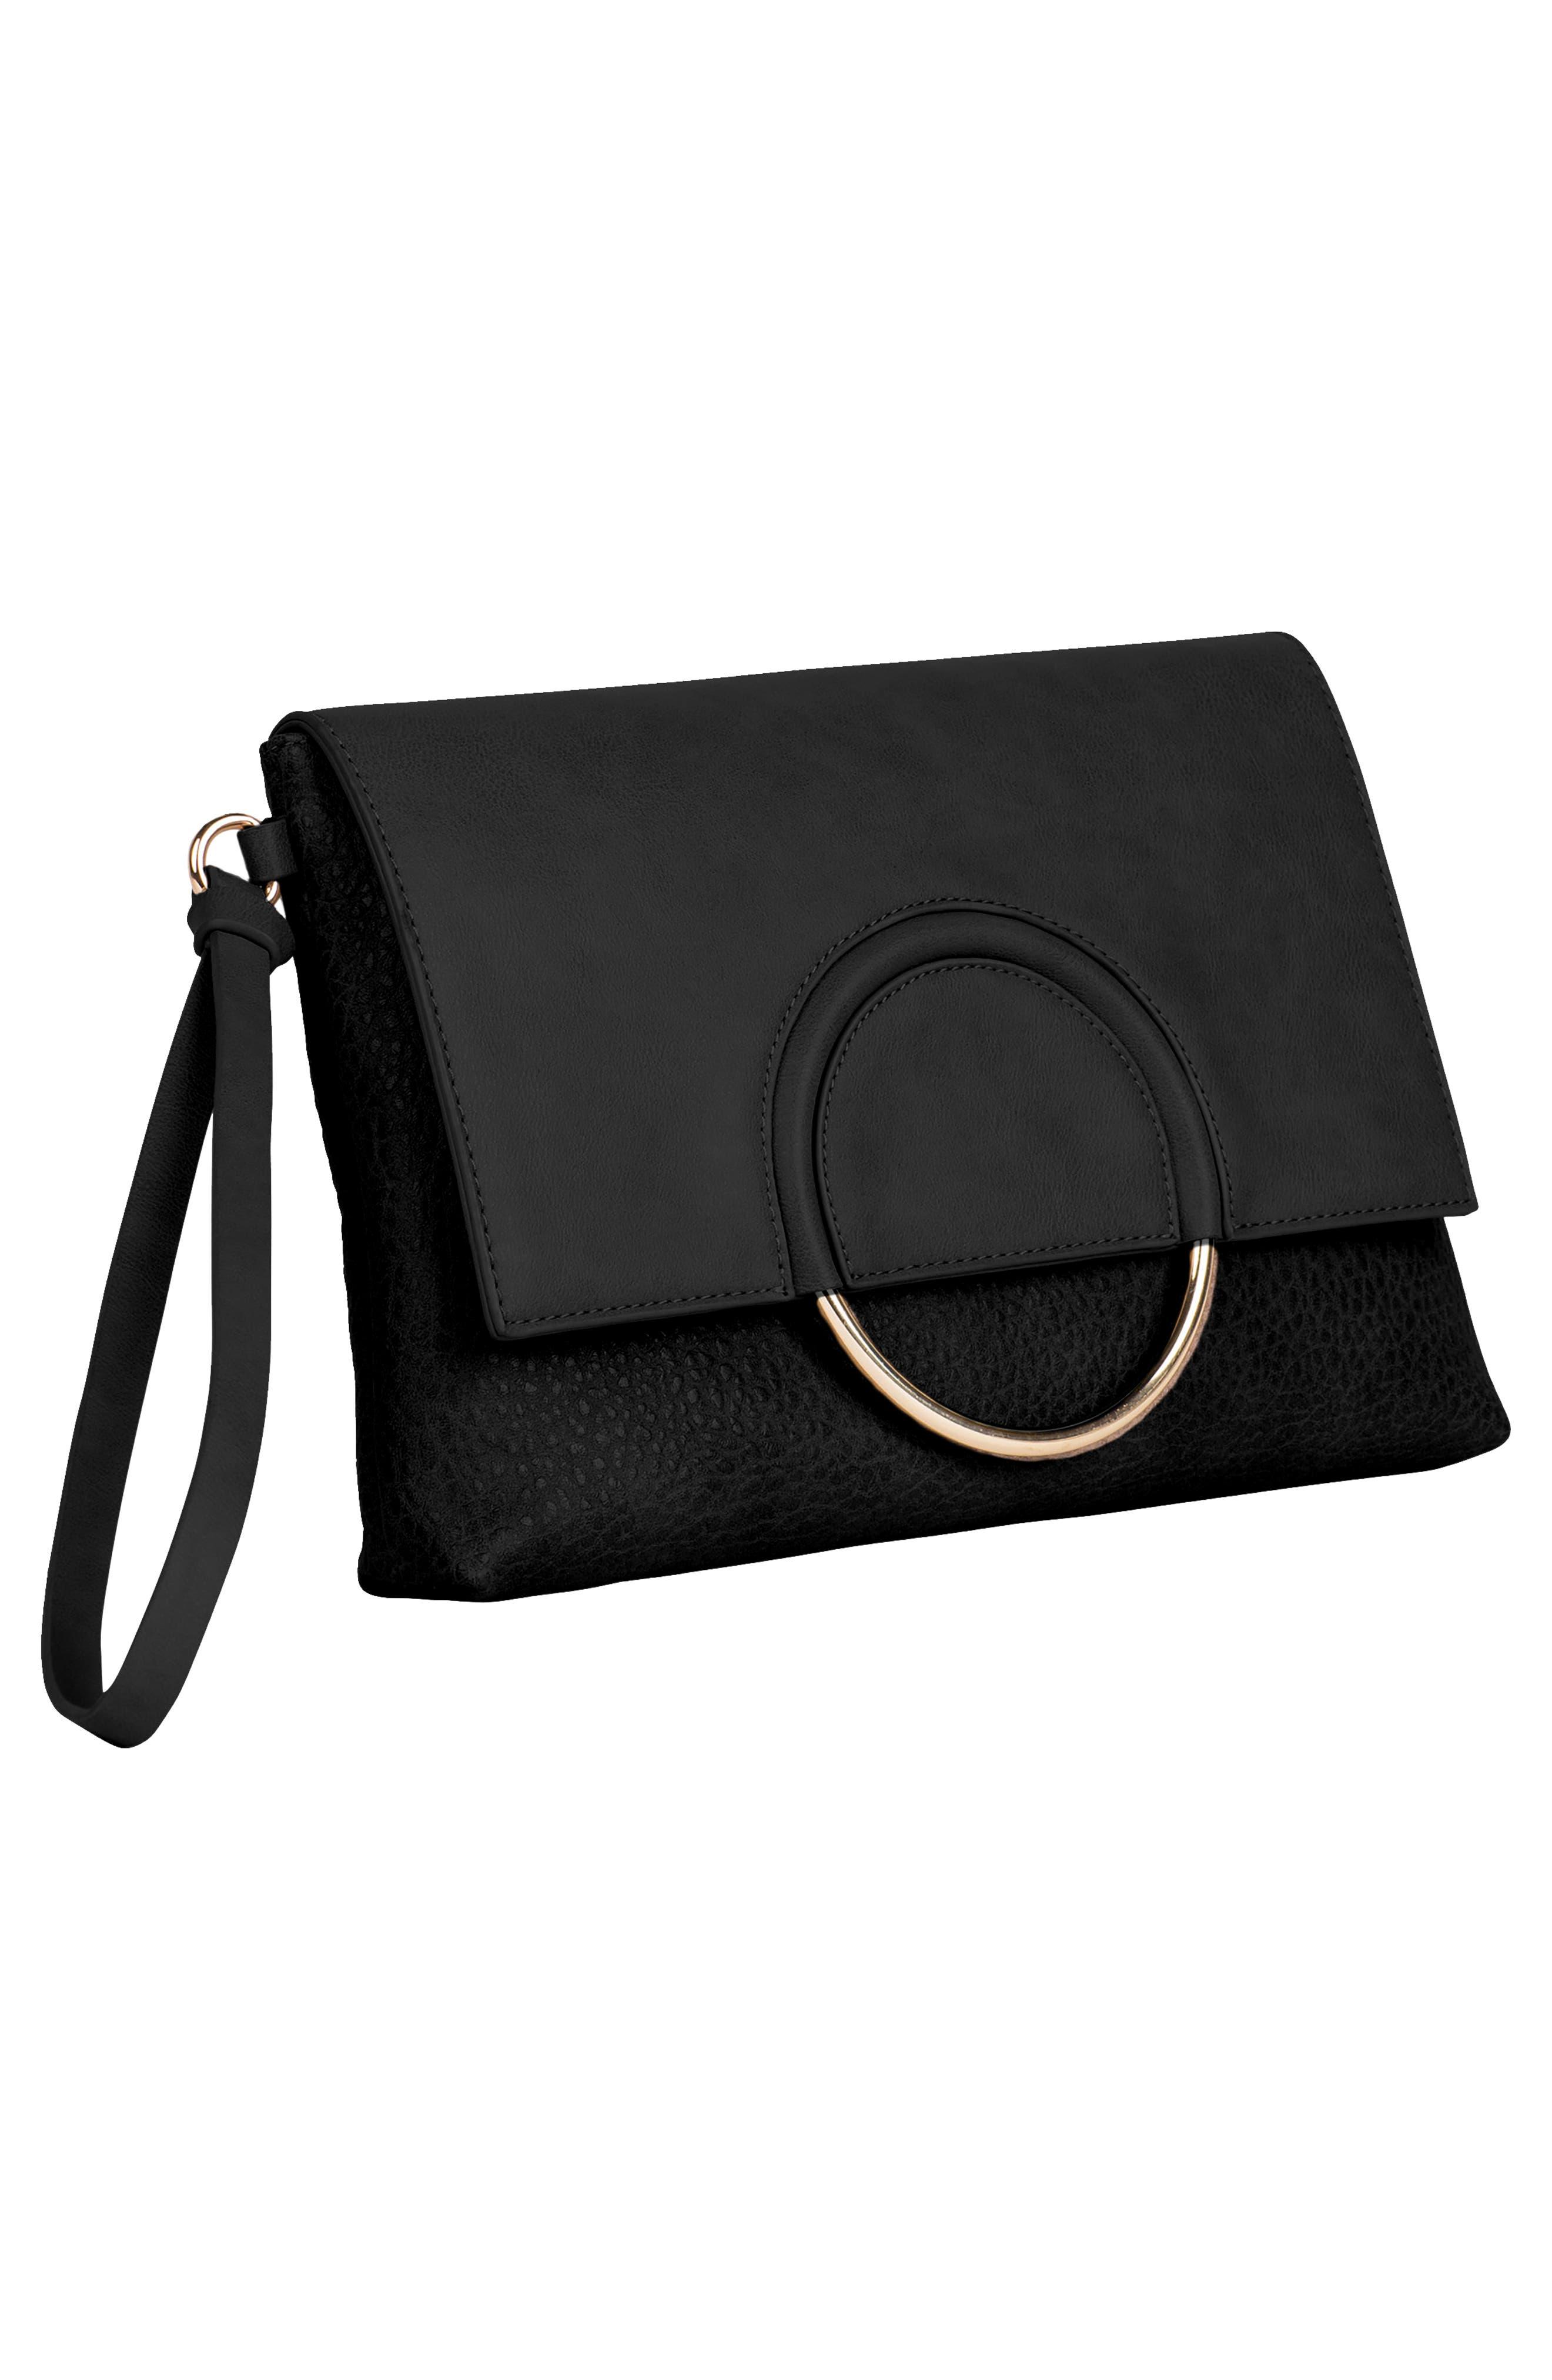 Custom Vegan Leather Wristlet Clutch,                             Alternate thumbnail 3, color,                             BLACK